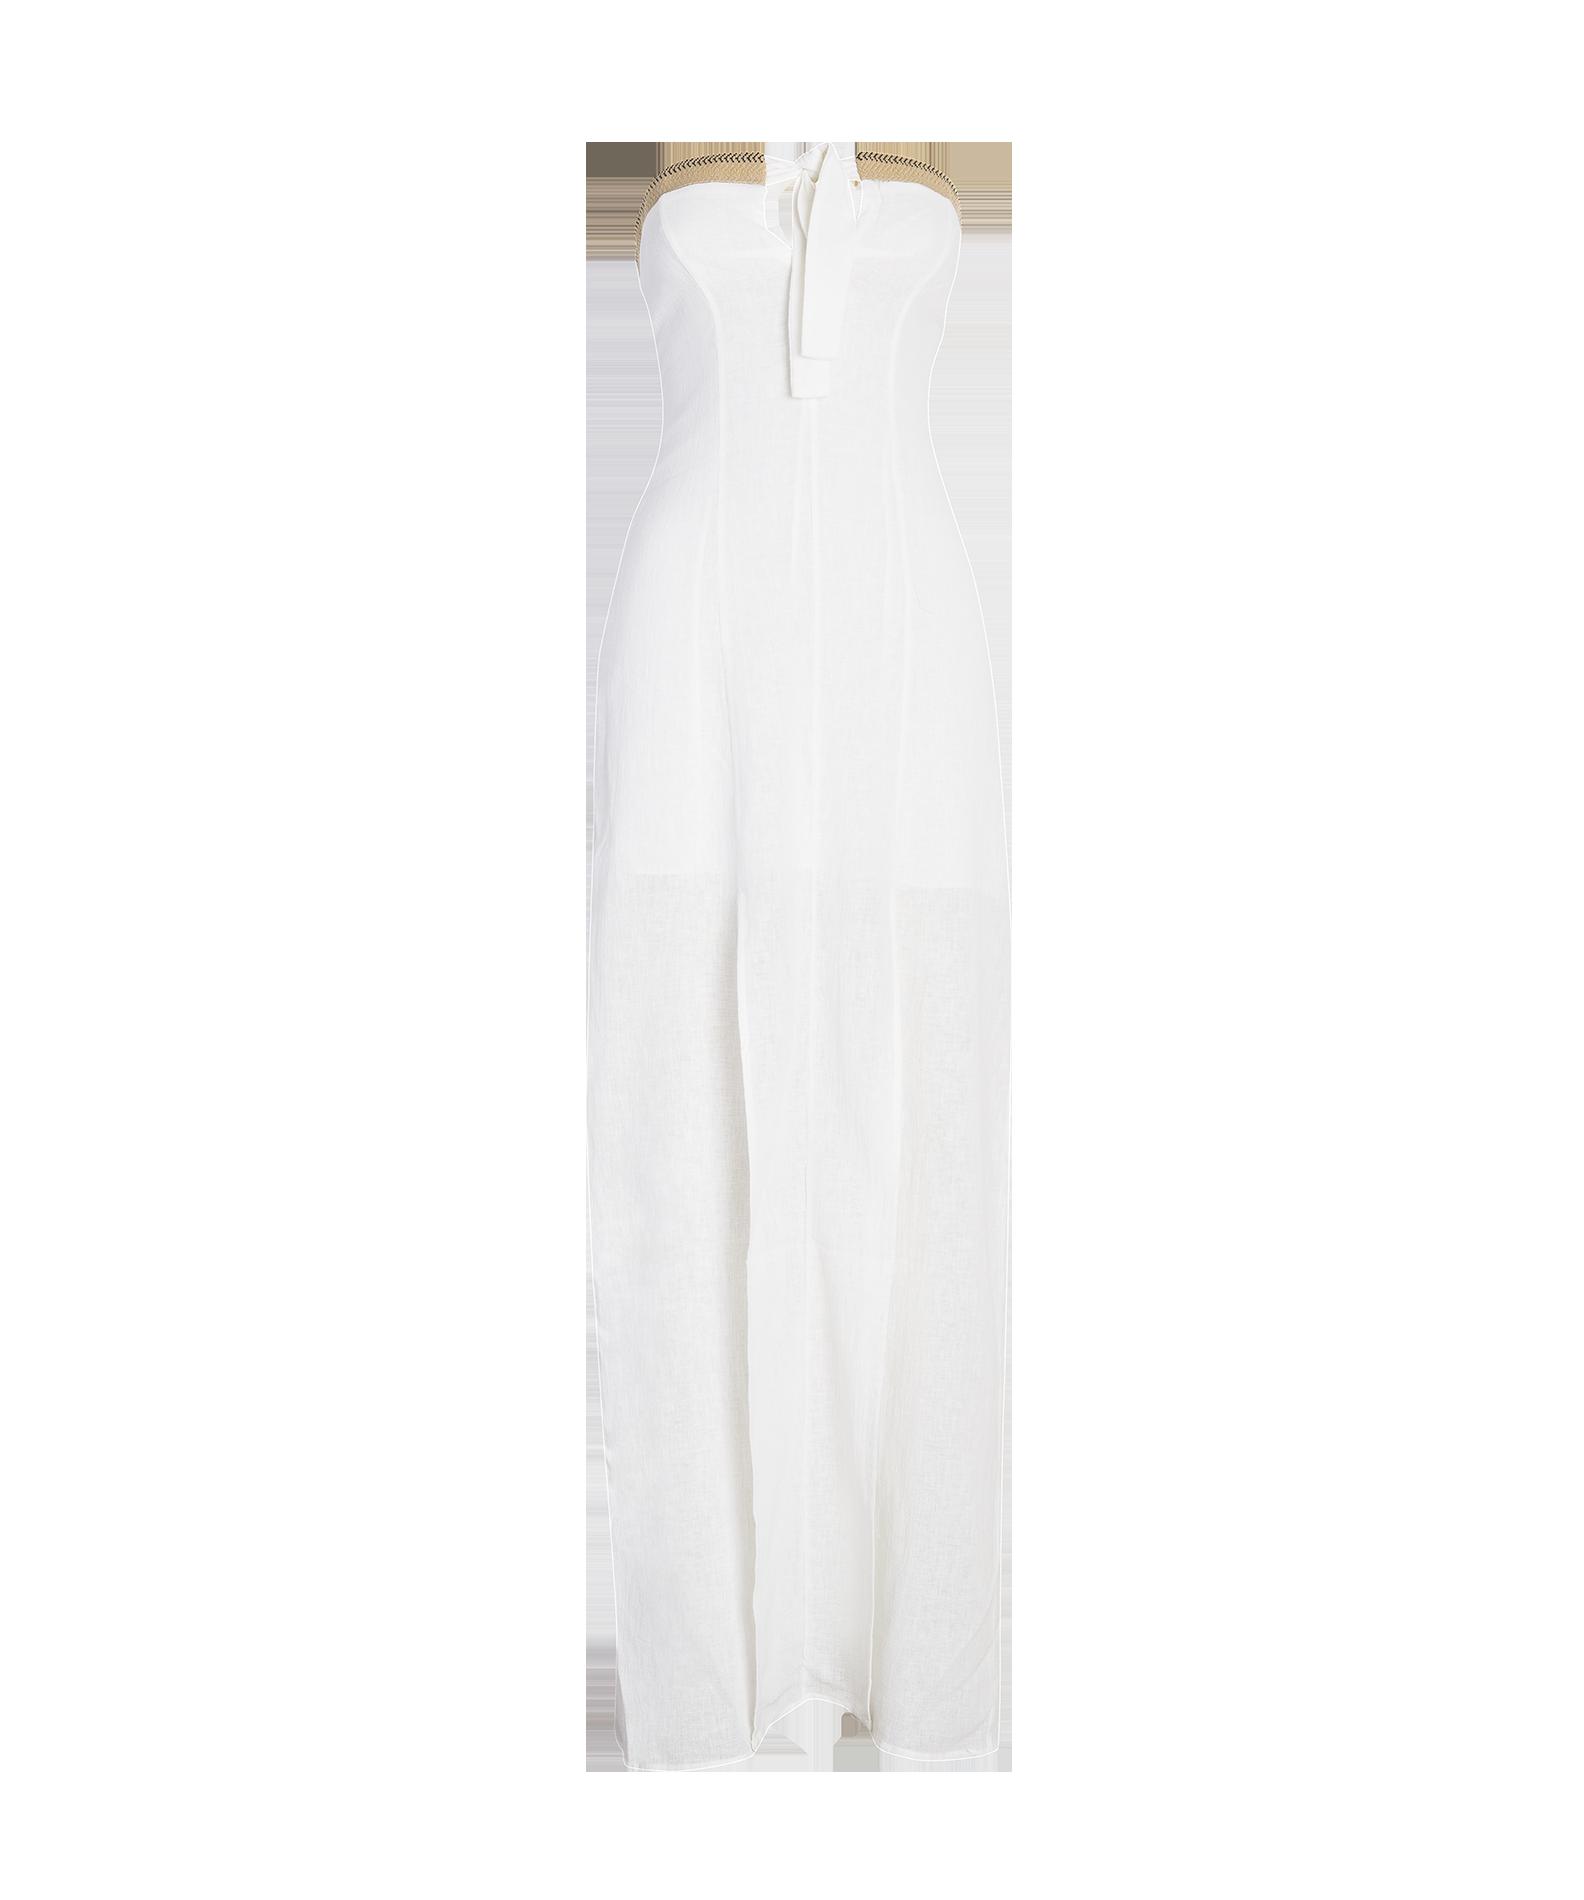 1584x1900 Solid Off White Maria Long Dress Vix Swimwear